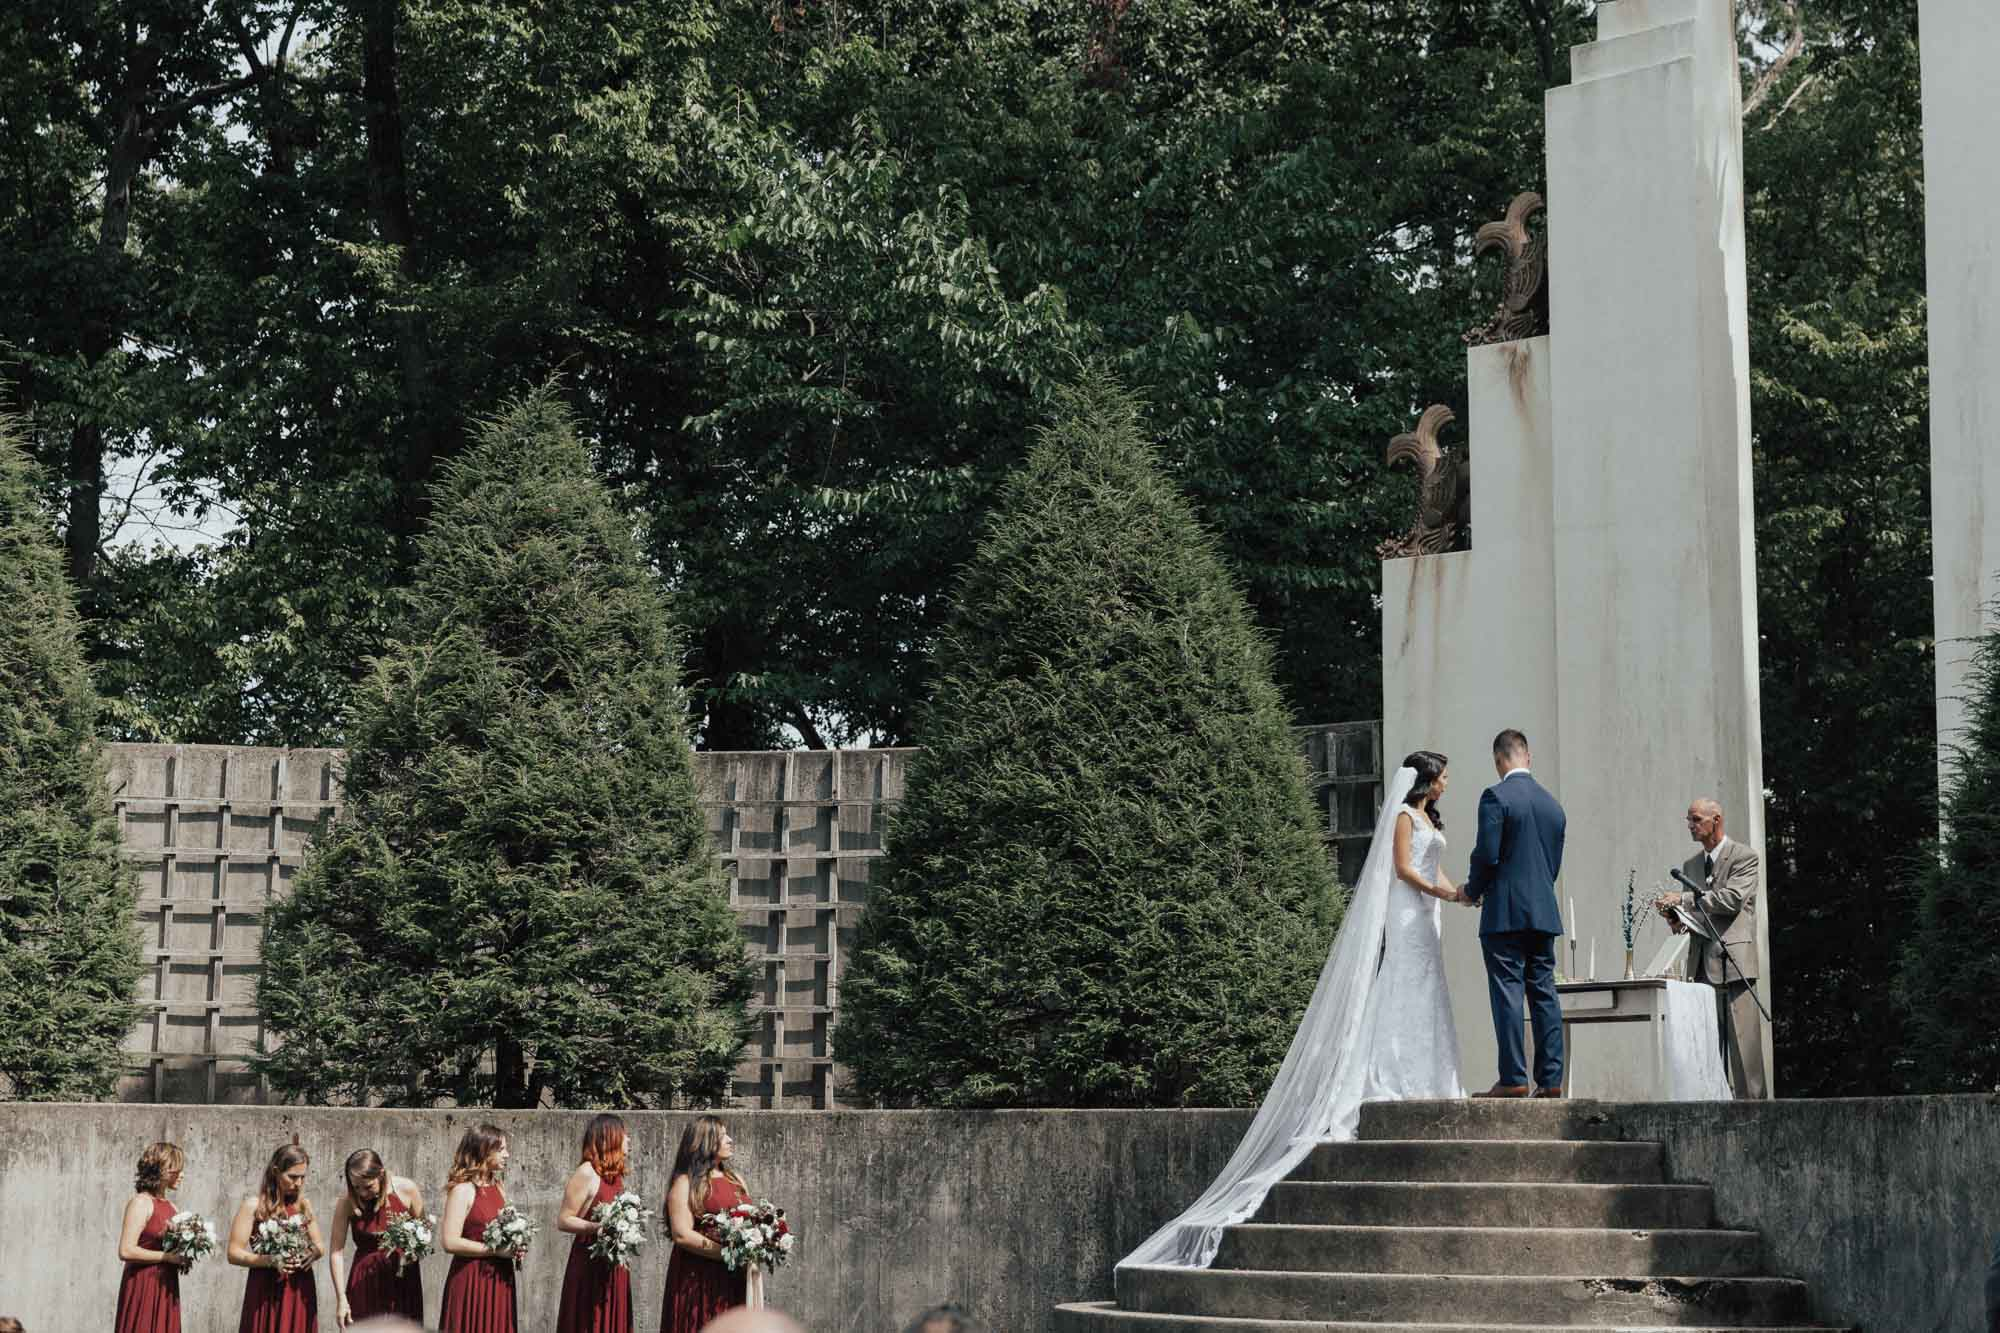 champaign_il_wedding_photography-0302.jpg